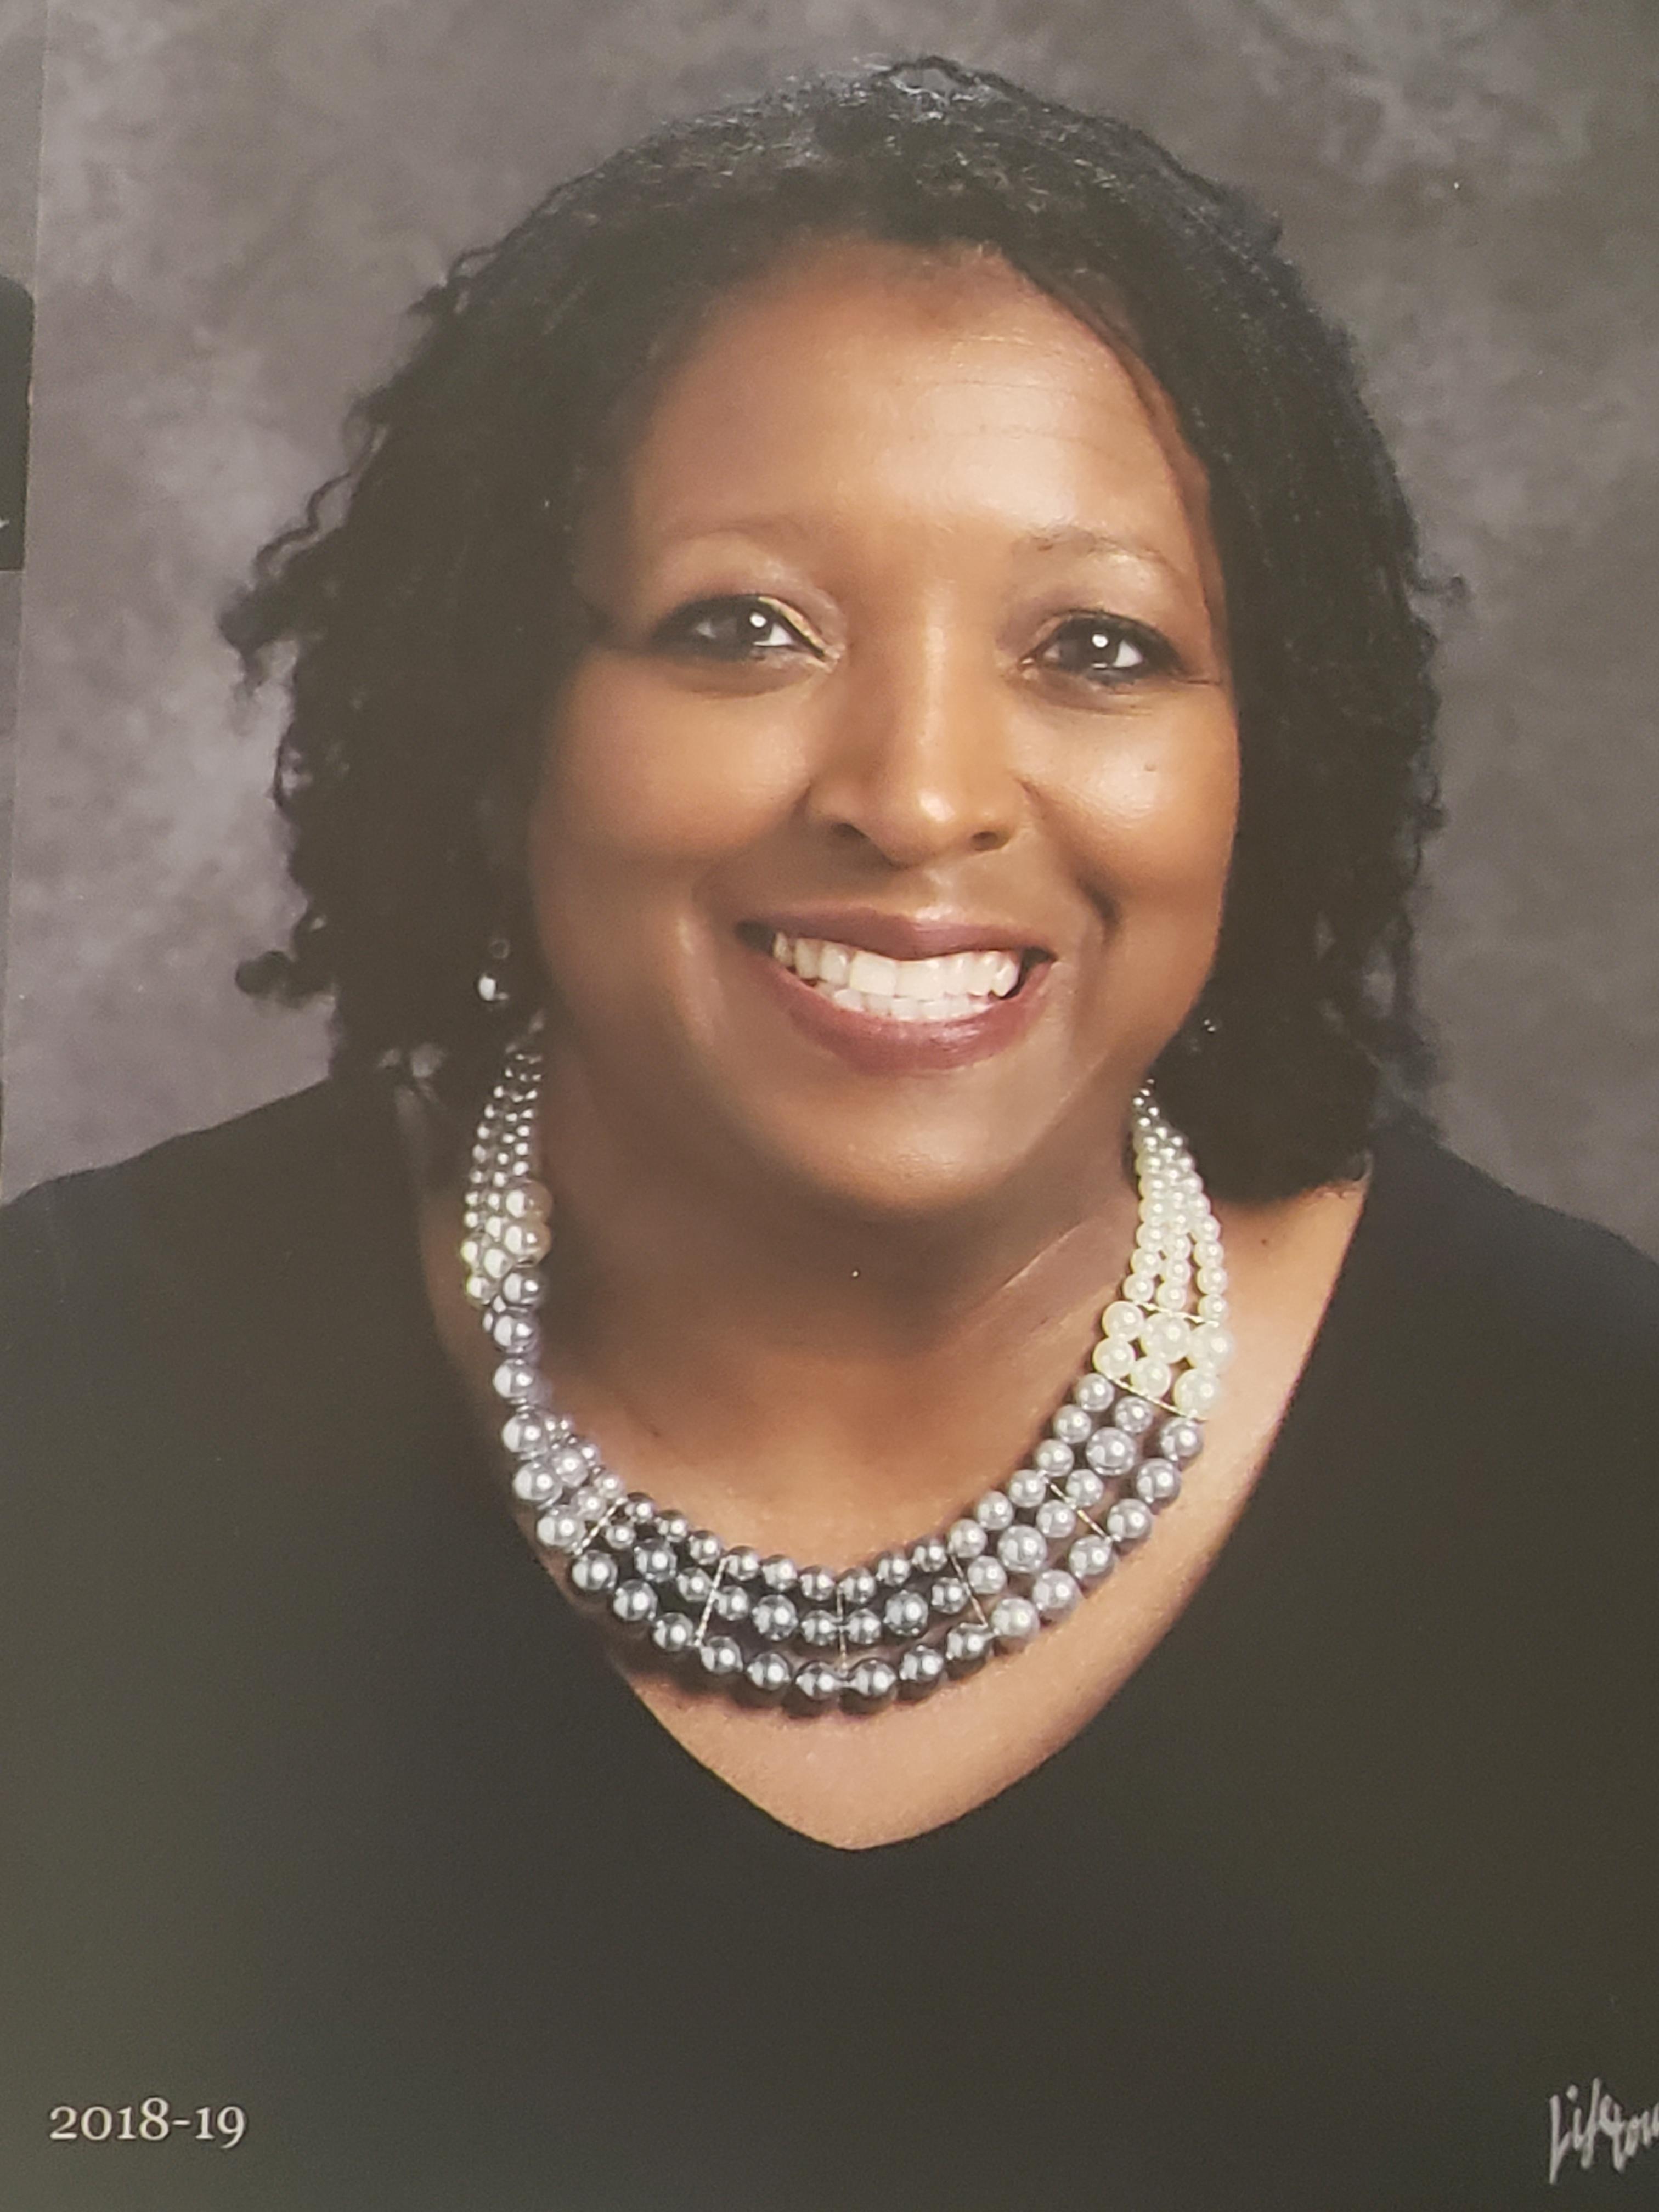 A photo of Principal Tammy Armant-Hill